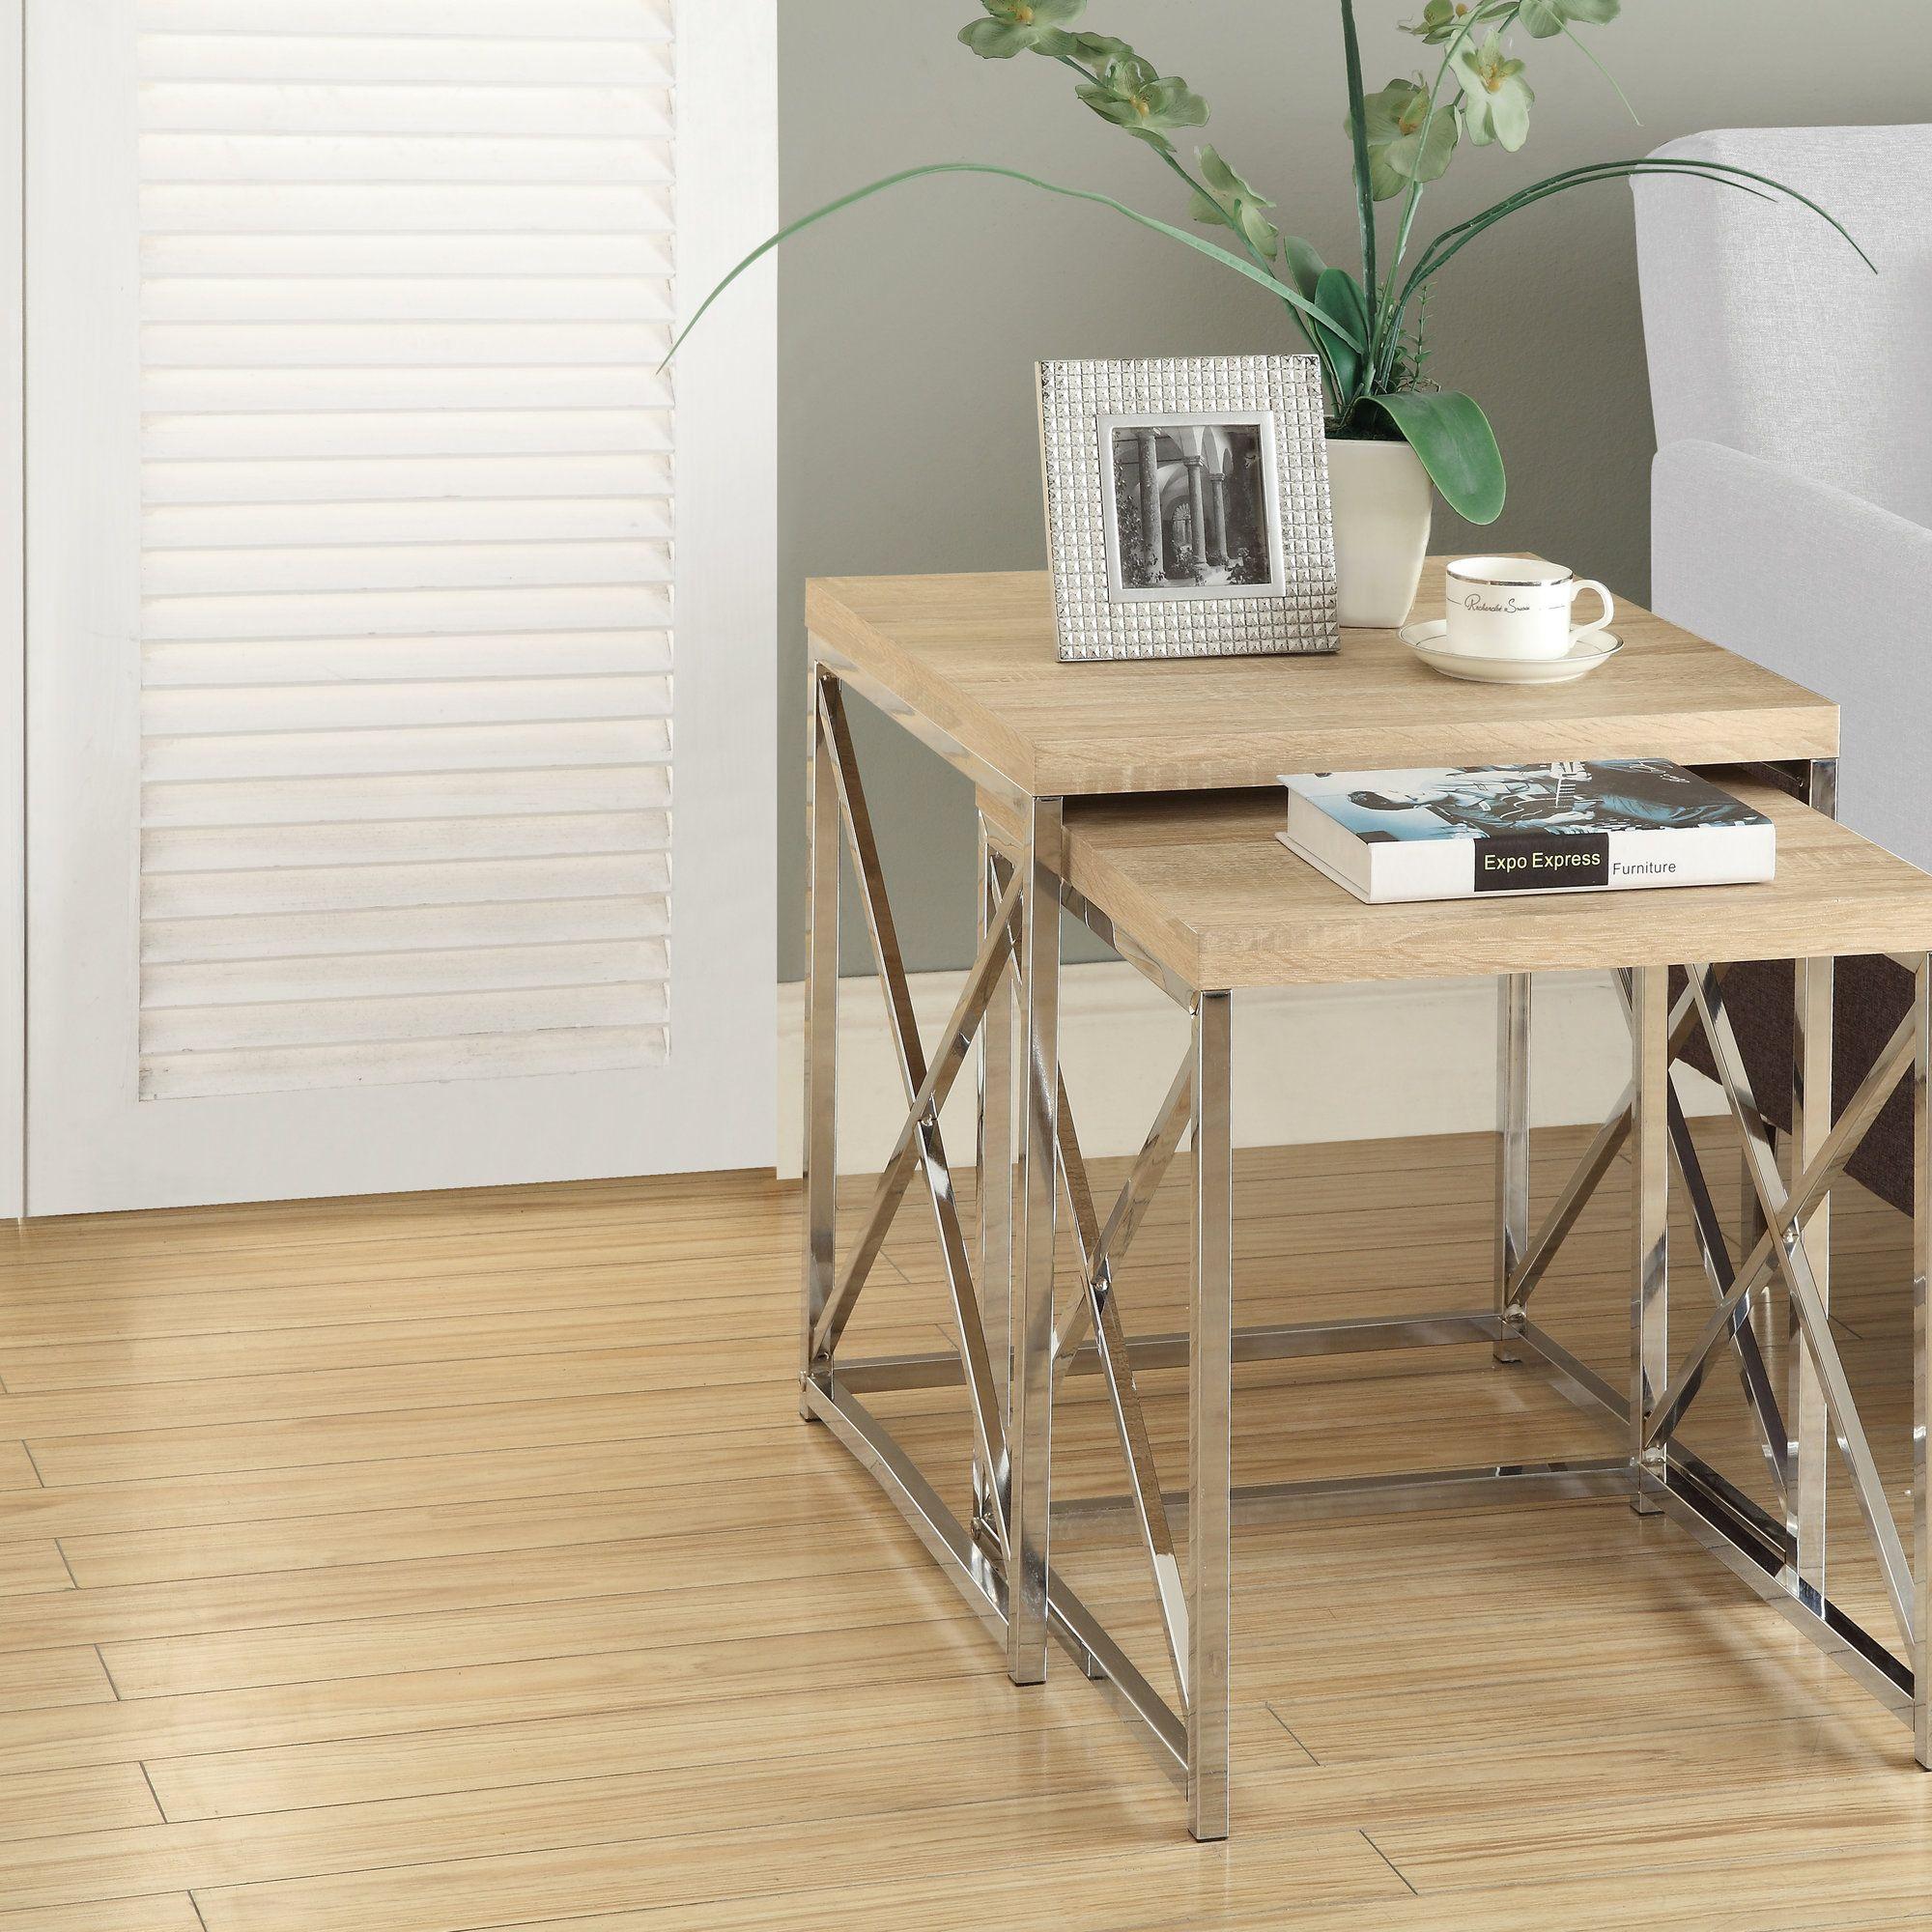 baez 2 piece nesting table set products pinterest products